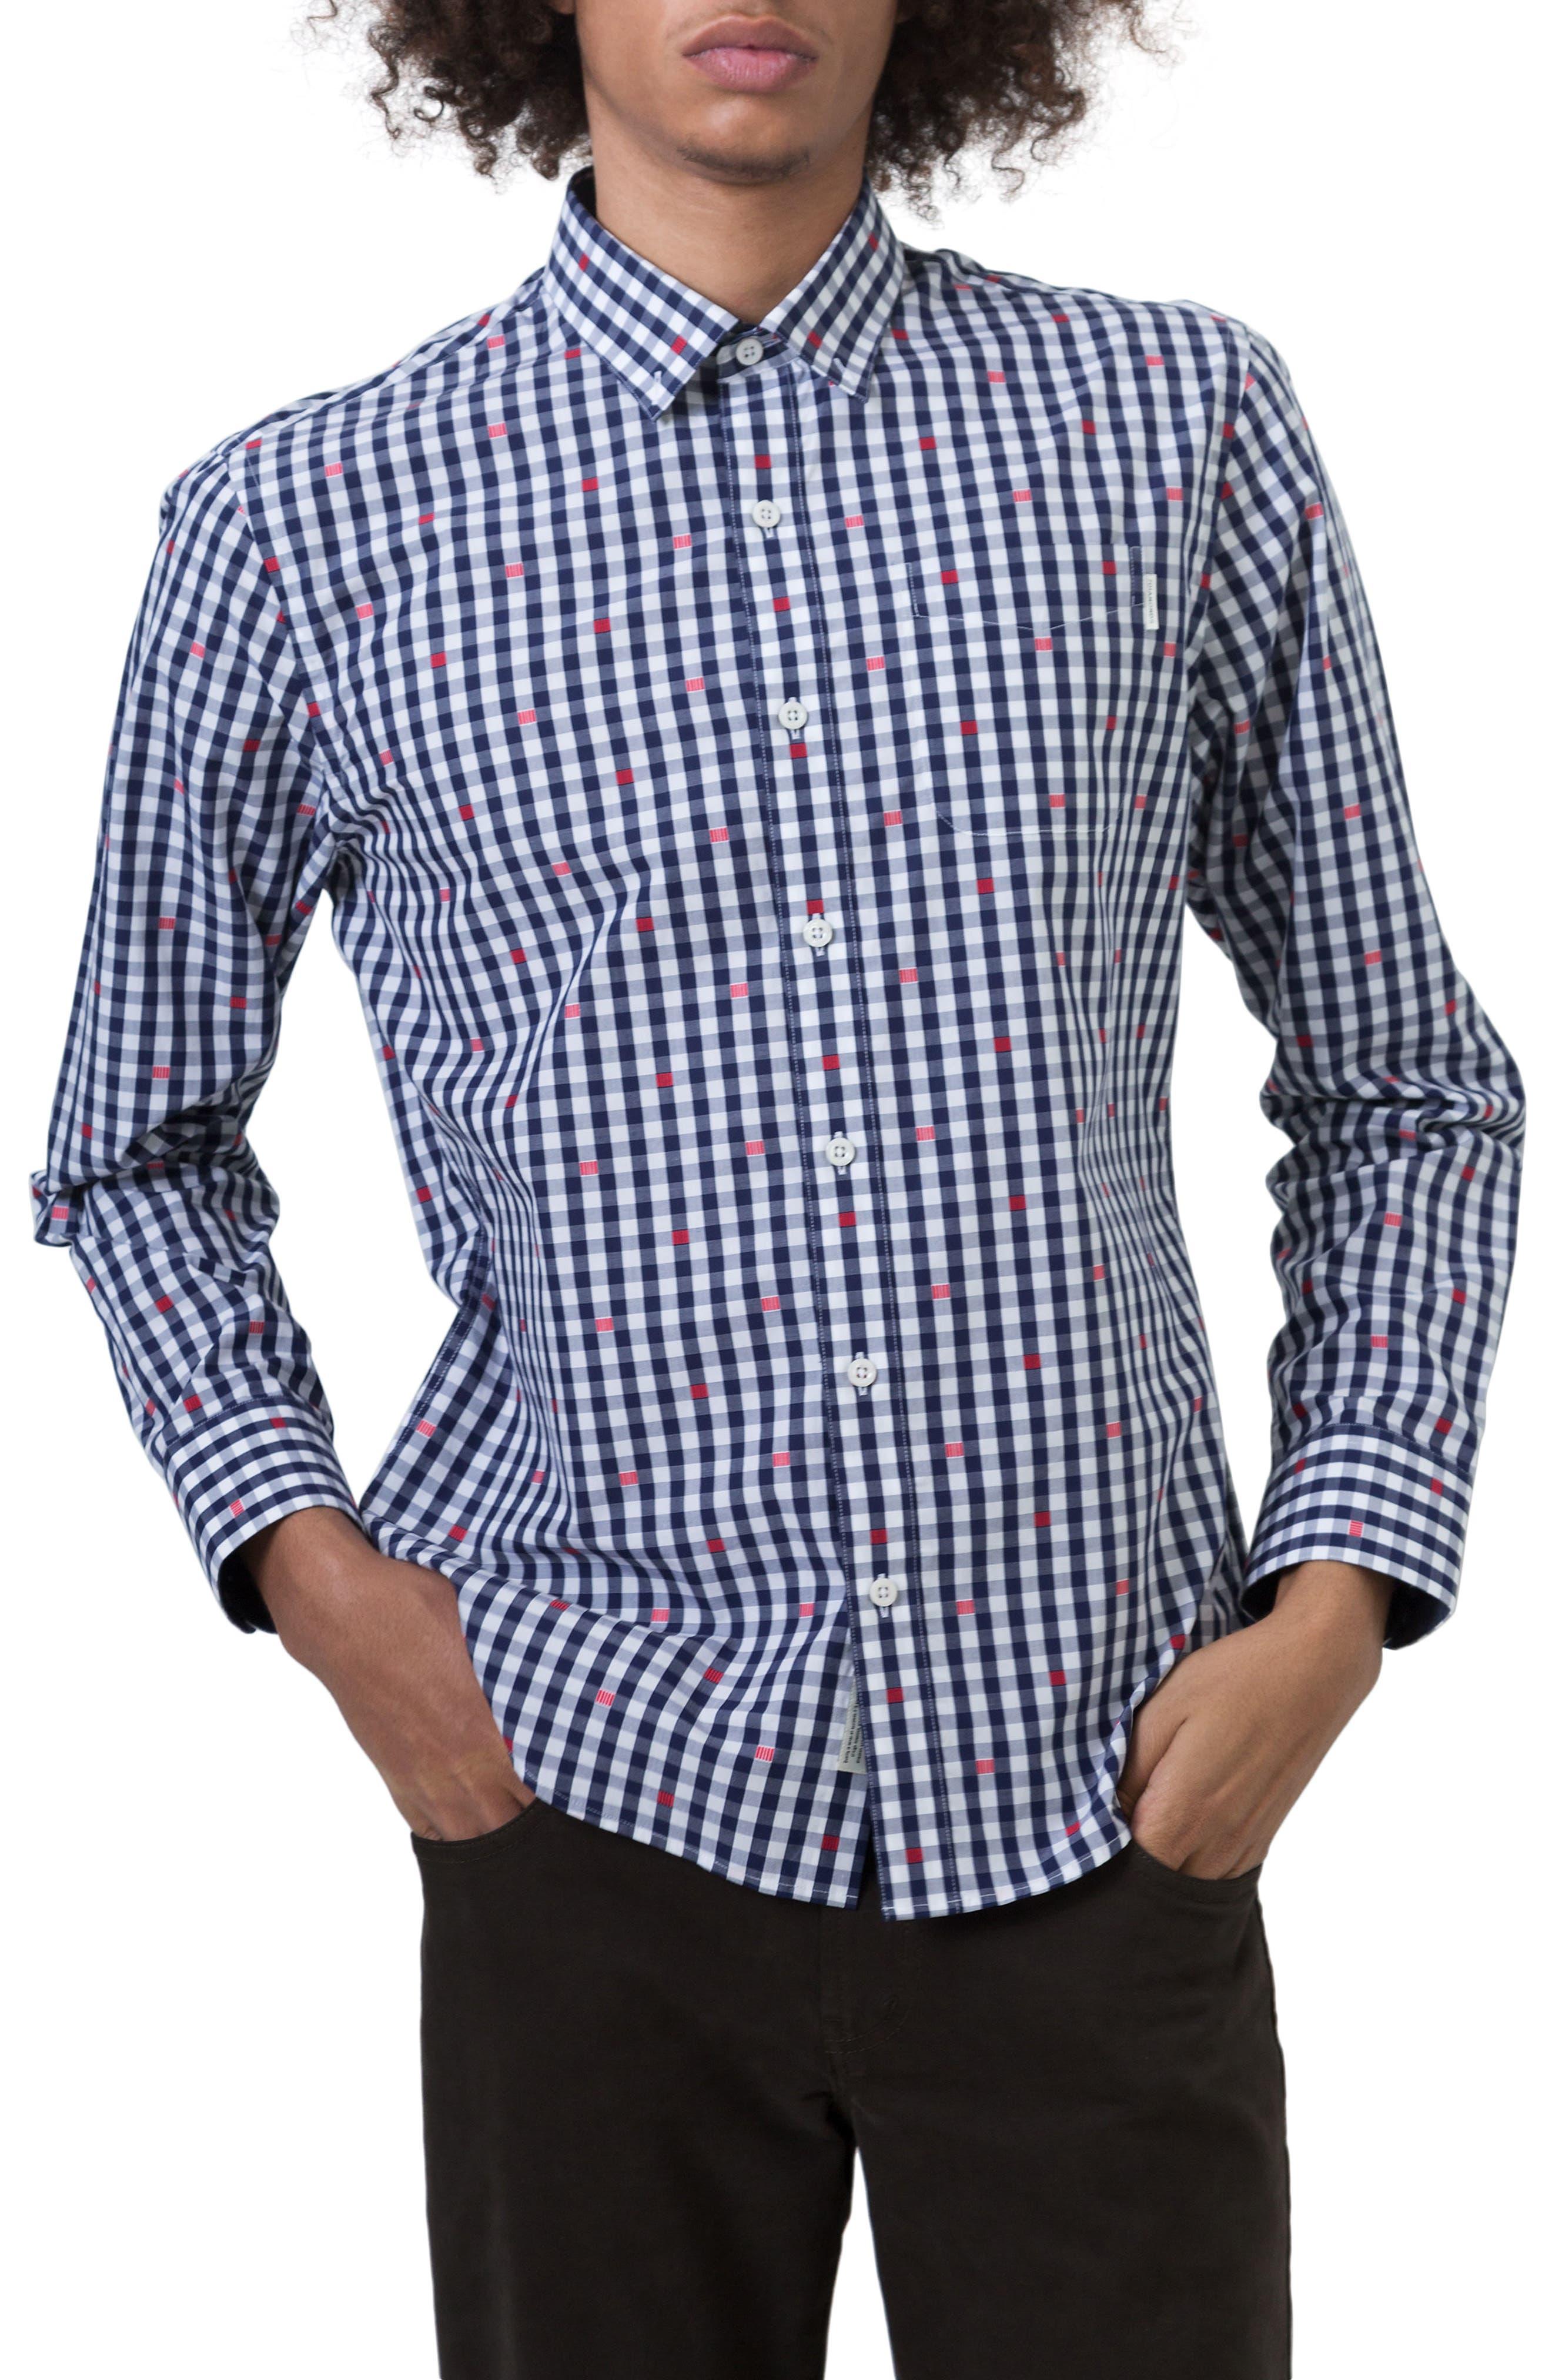 7 Diamonds Petrichor Woven Shirt